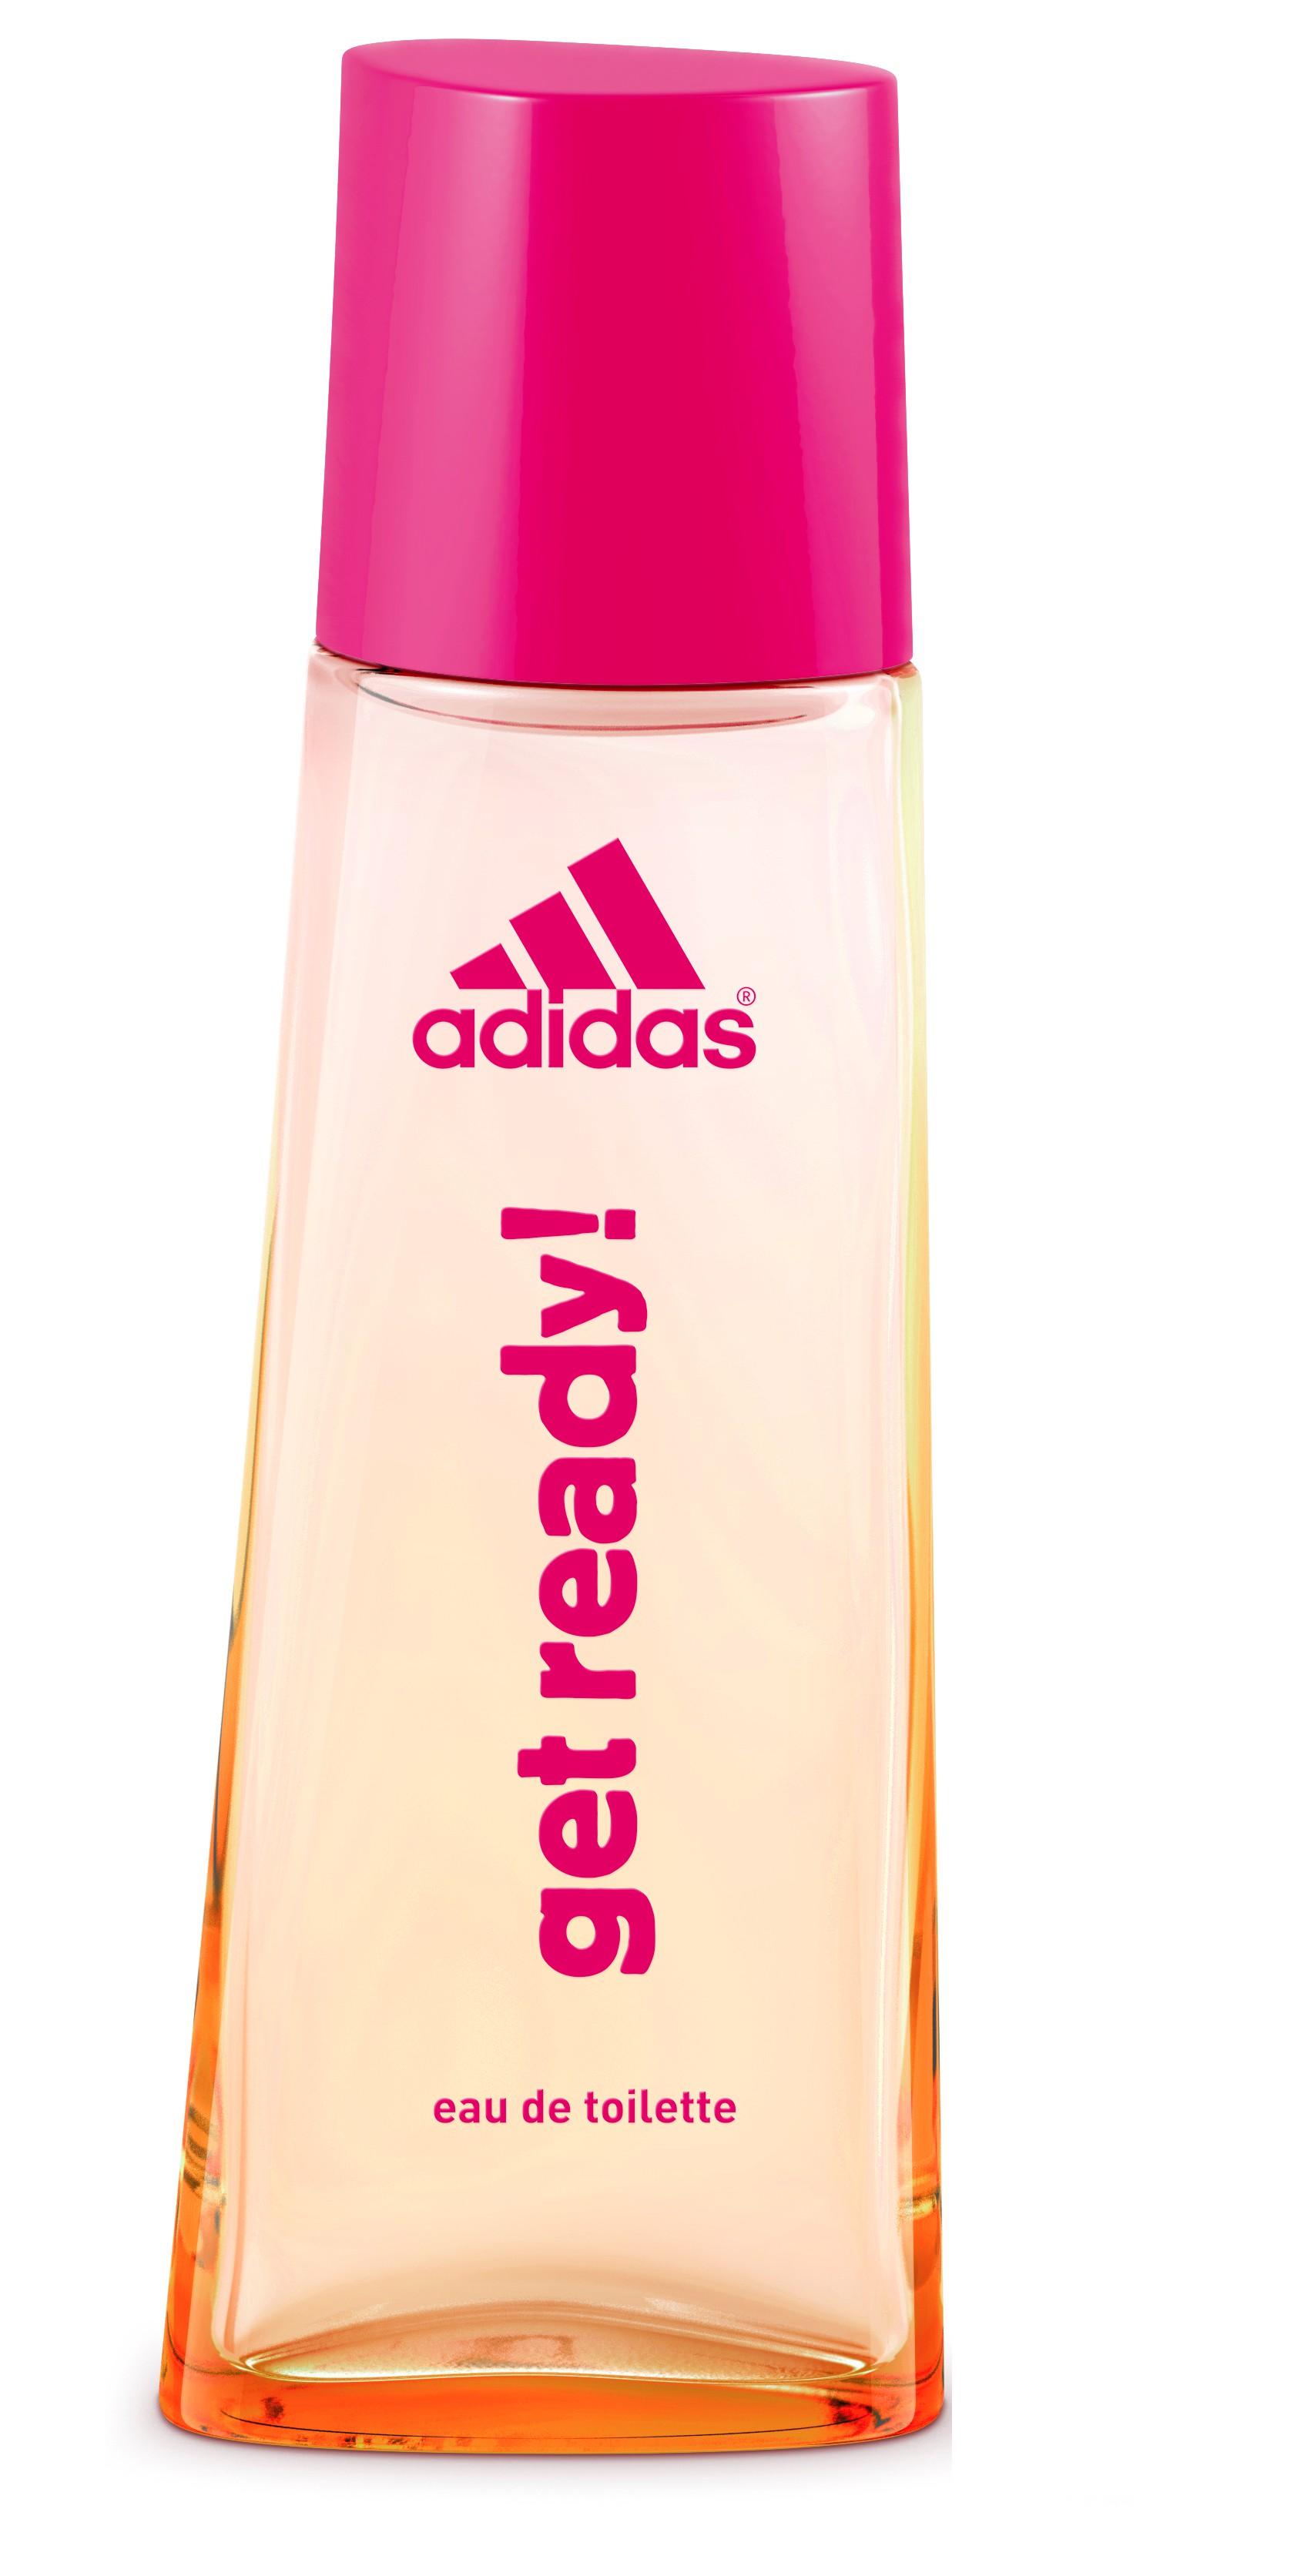 Adidas Get Ready For Her аромат для женщин